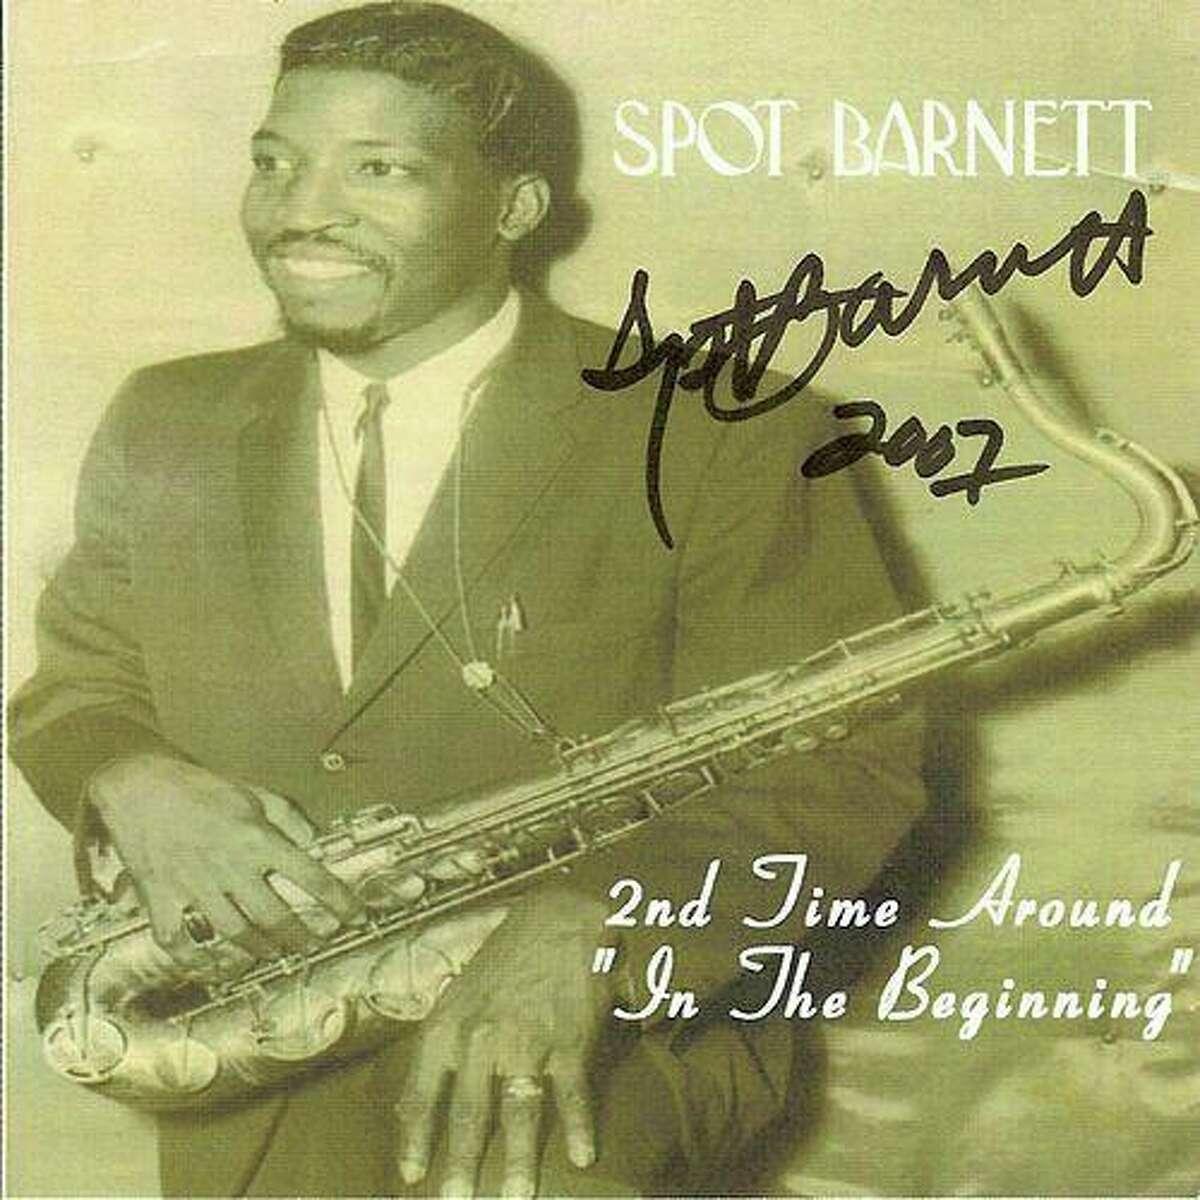 Spot Barnett has been a prominent figure on the East Side music scene since 1955